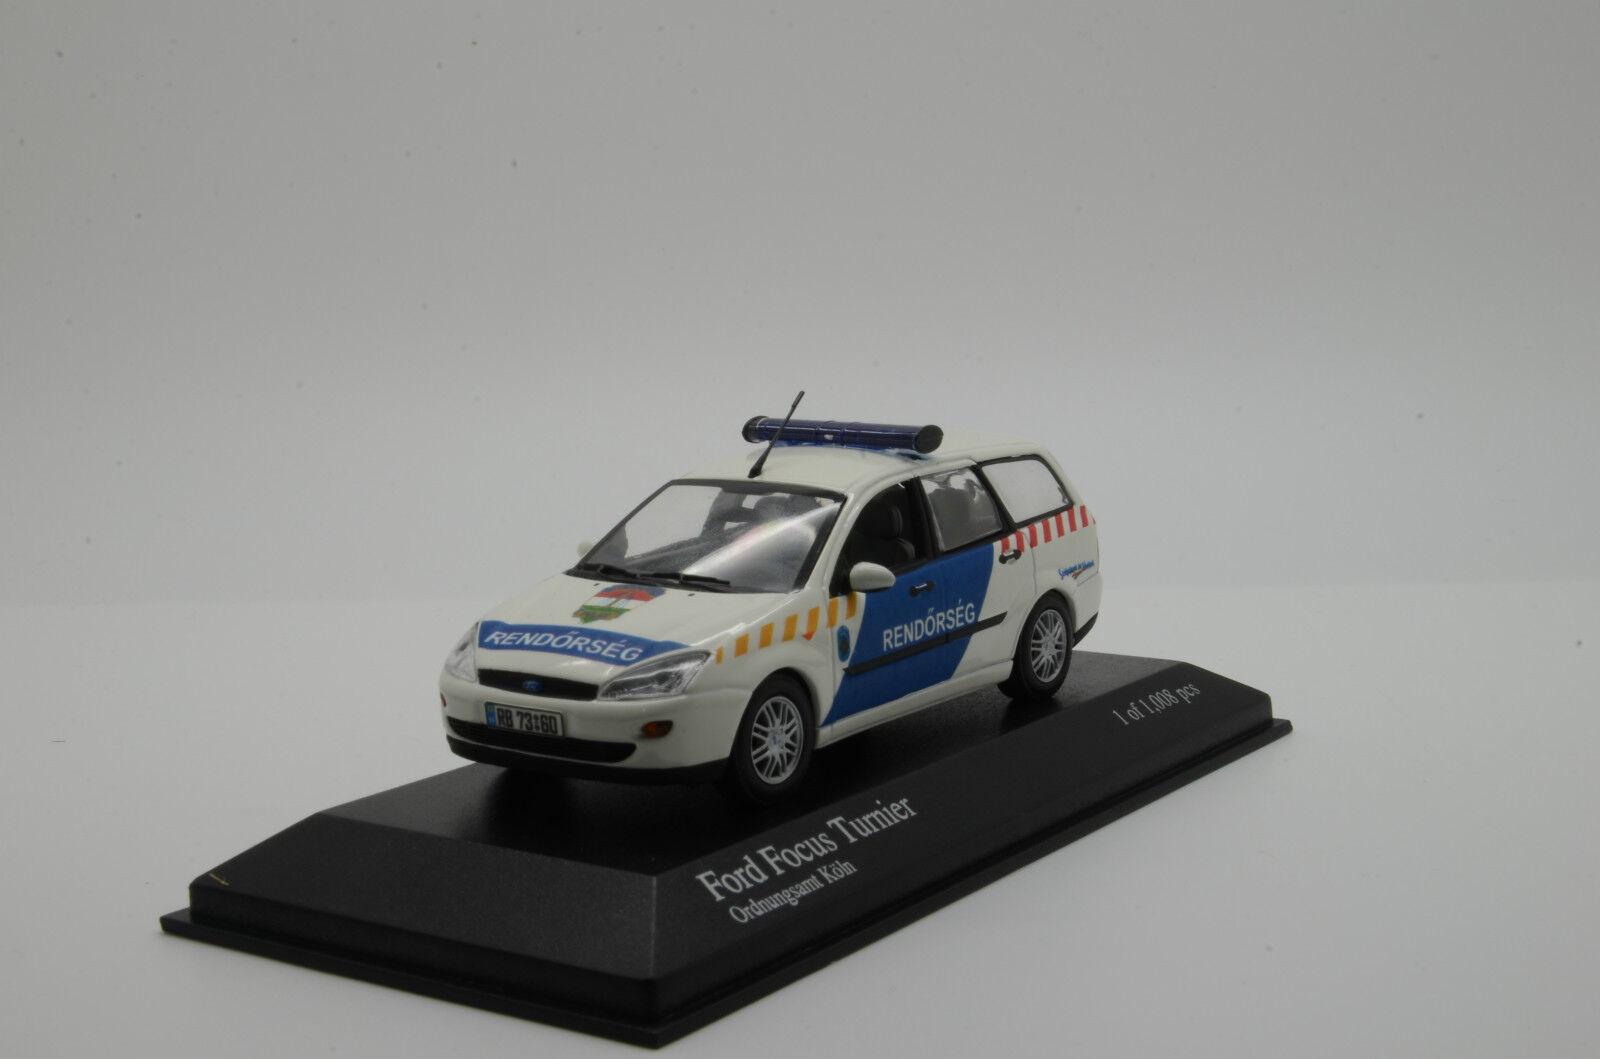 RARE    Ford Focus Turnier Rendorseg Rendőrség Hungary Police Minichamps 1 43